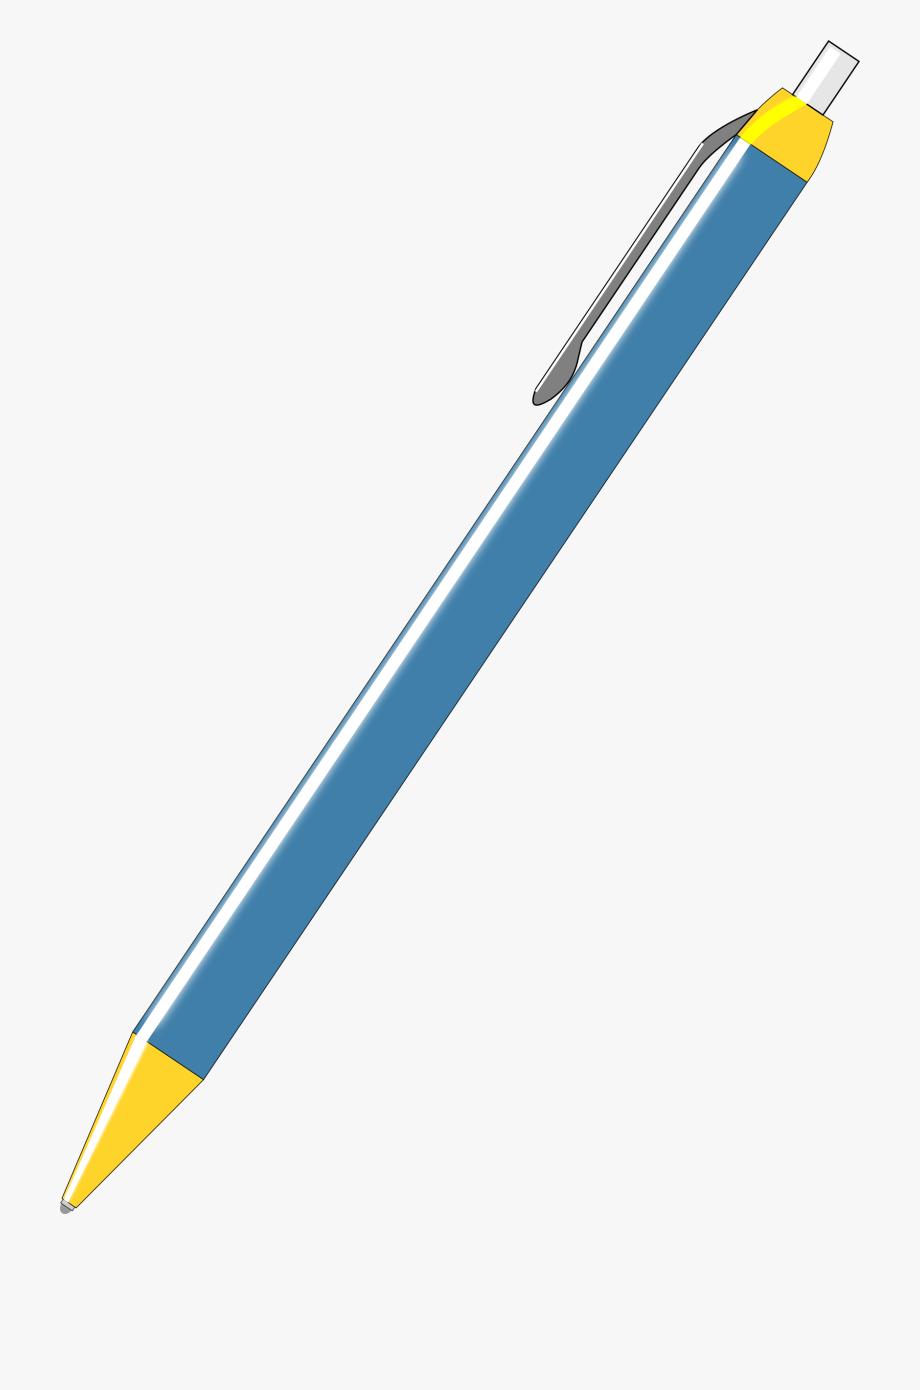 Pen clipart ballpen. Latest ballpoint